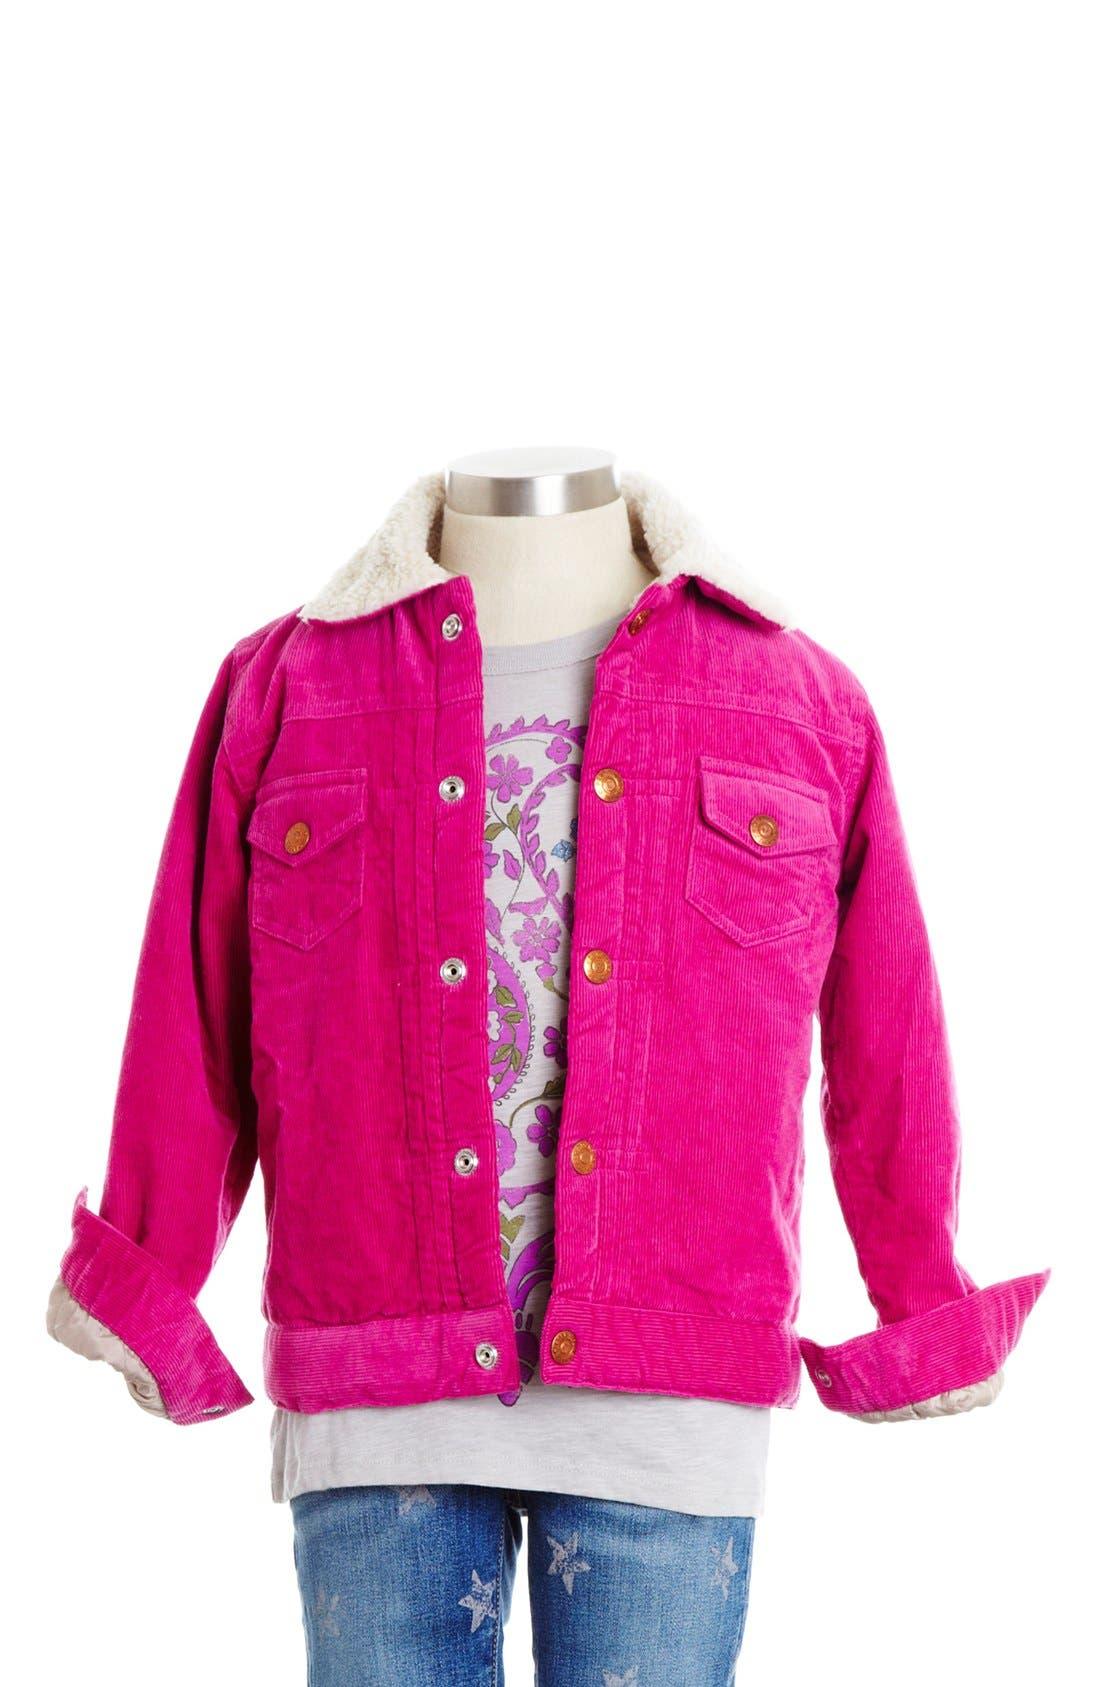 Alternate Image 1 Selected - Peek Faux Shearling Lined Corduroy Jacket (Toddler Girls, Little Girls & Big Girls)